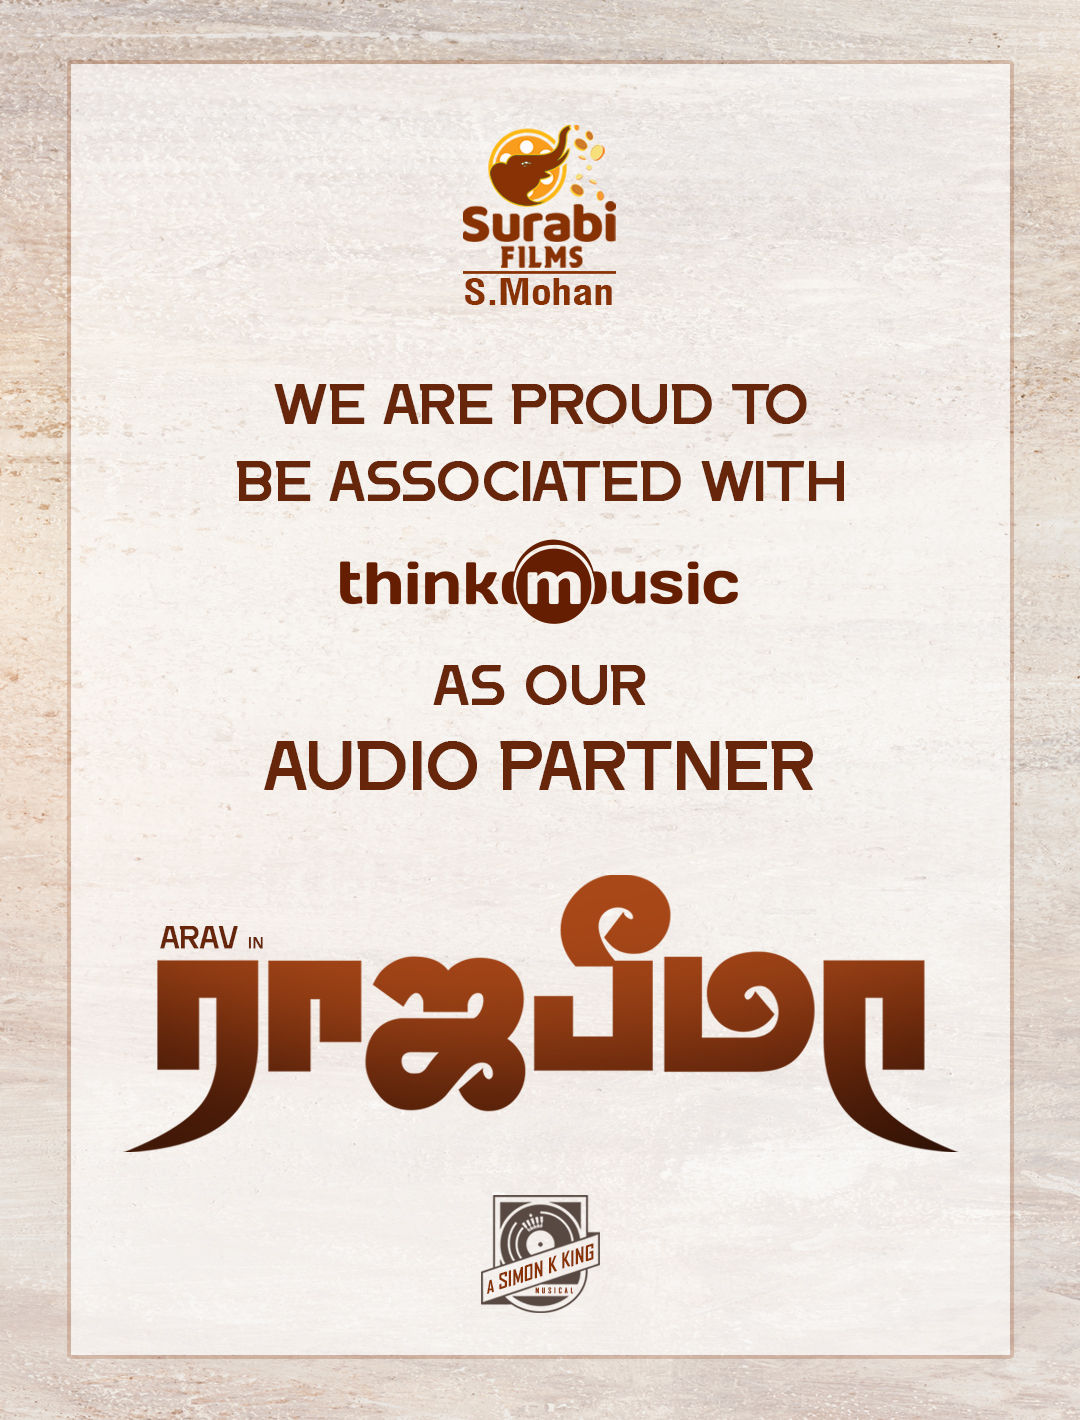 Raja Bheema movie audio rights acquired by Think Music